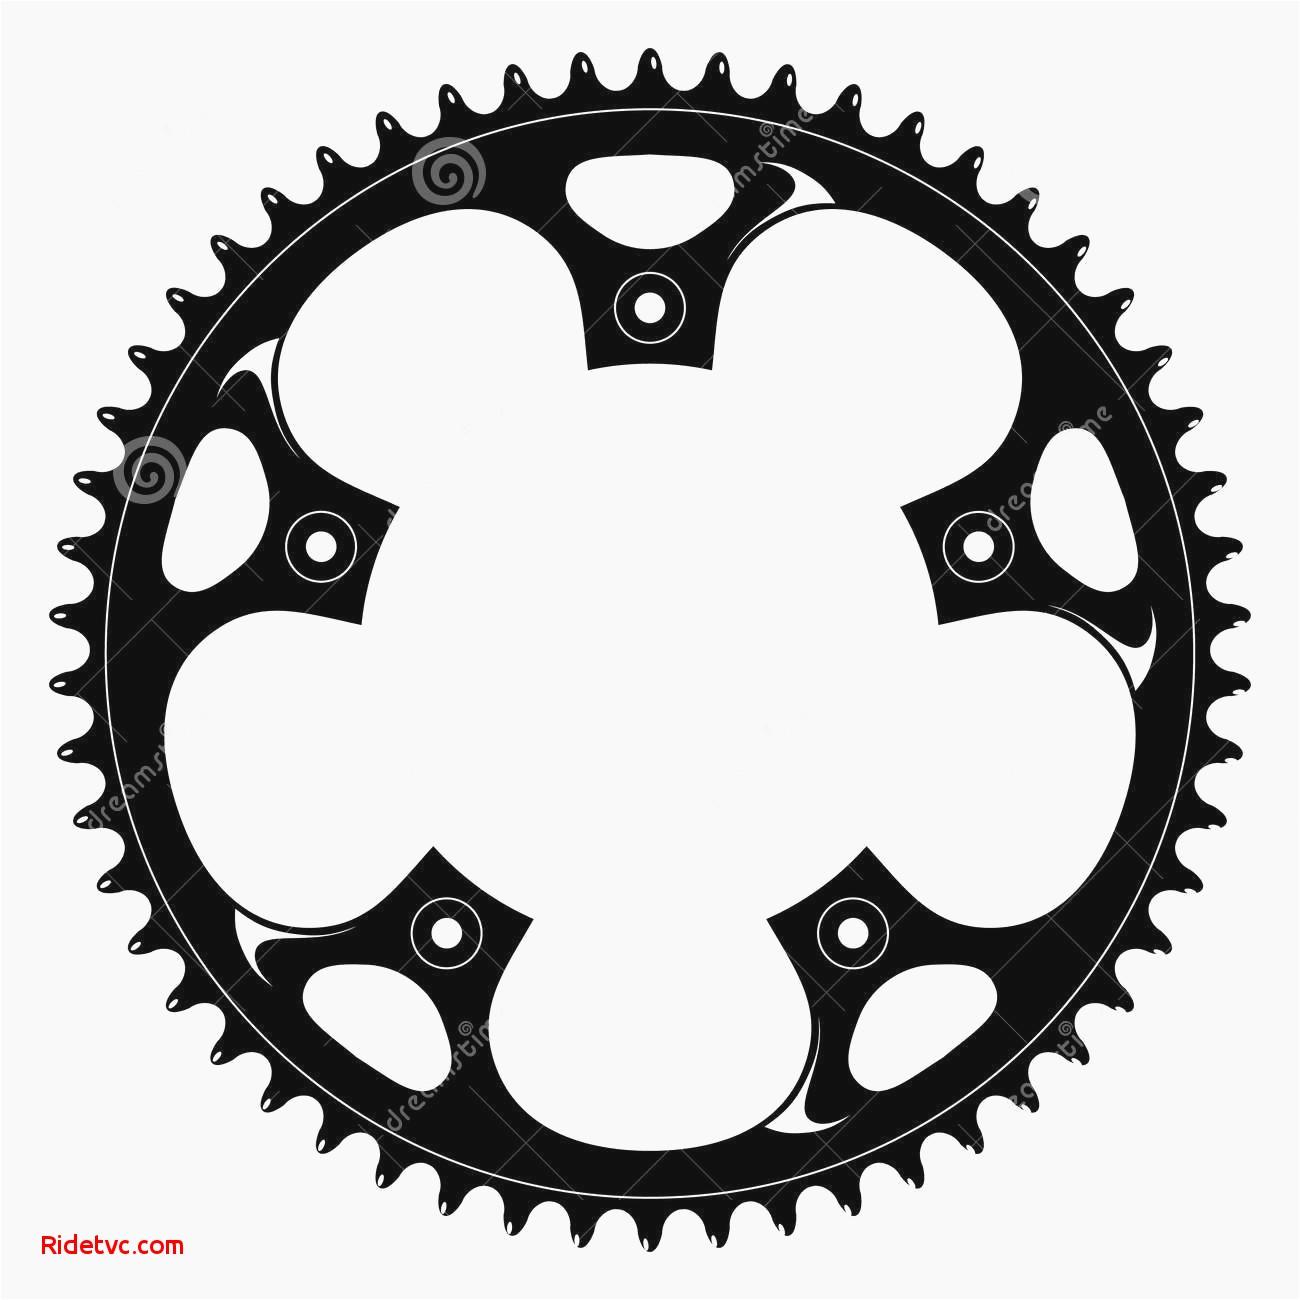 1300x1300 Bike Vector Art Free Download Elegant Bicycle Clipart Bike Gear